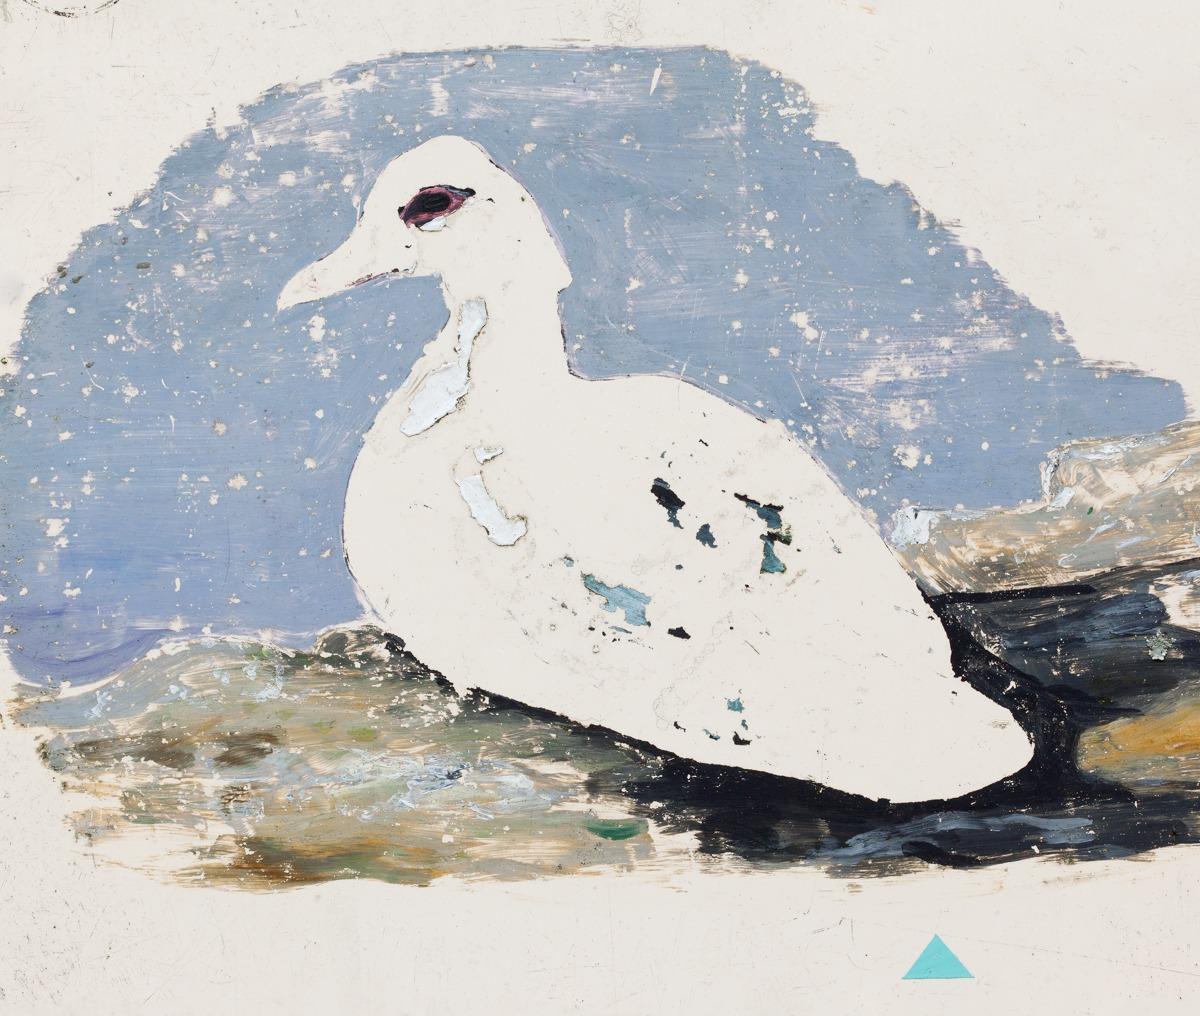 Bird 3, Lough, Cork, 2013 copy